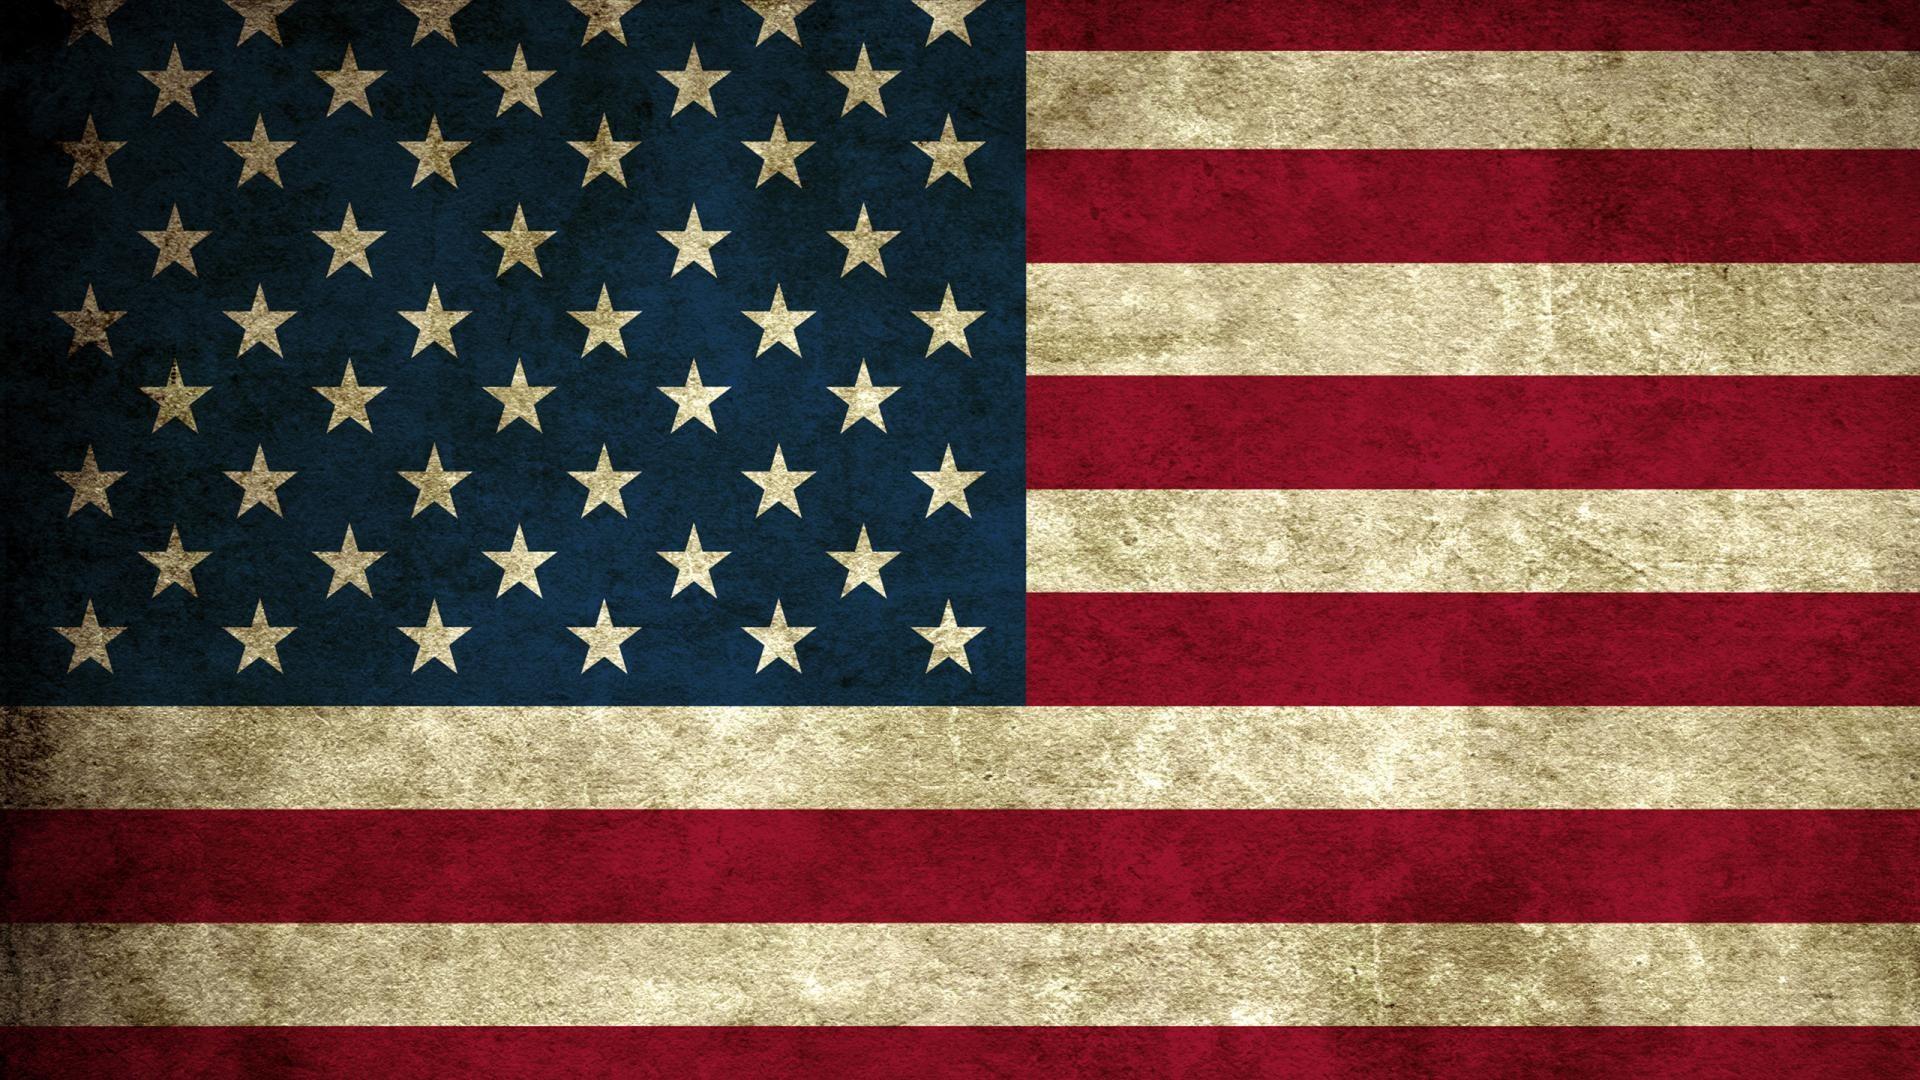 US Flag Screensaver Waving American Flag And Free 3D